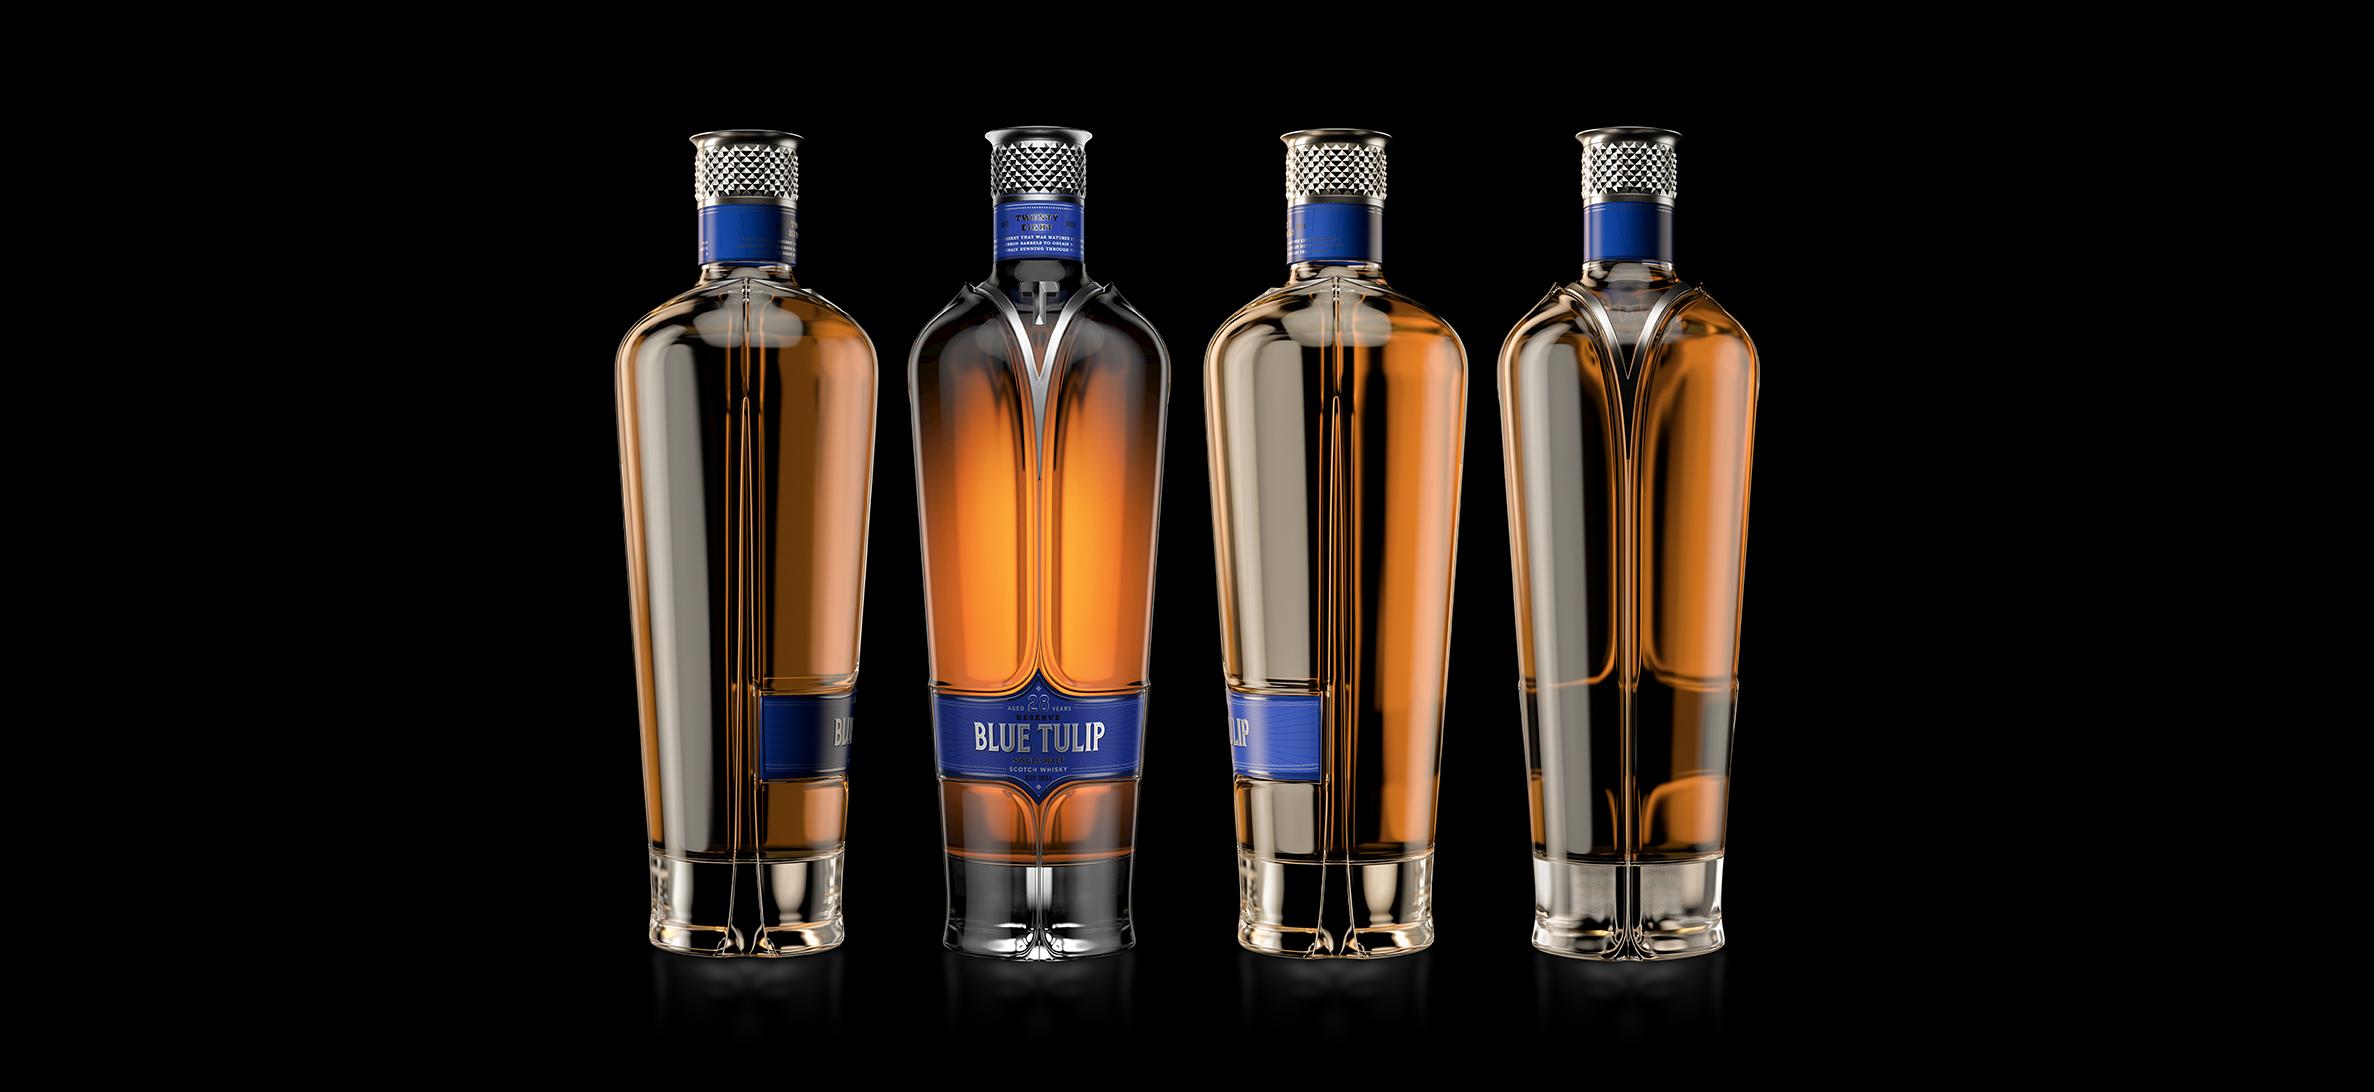 Puigdemont Roca Studio Creates Blue Tulip Scotch Whisky